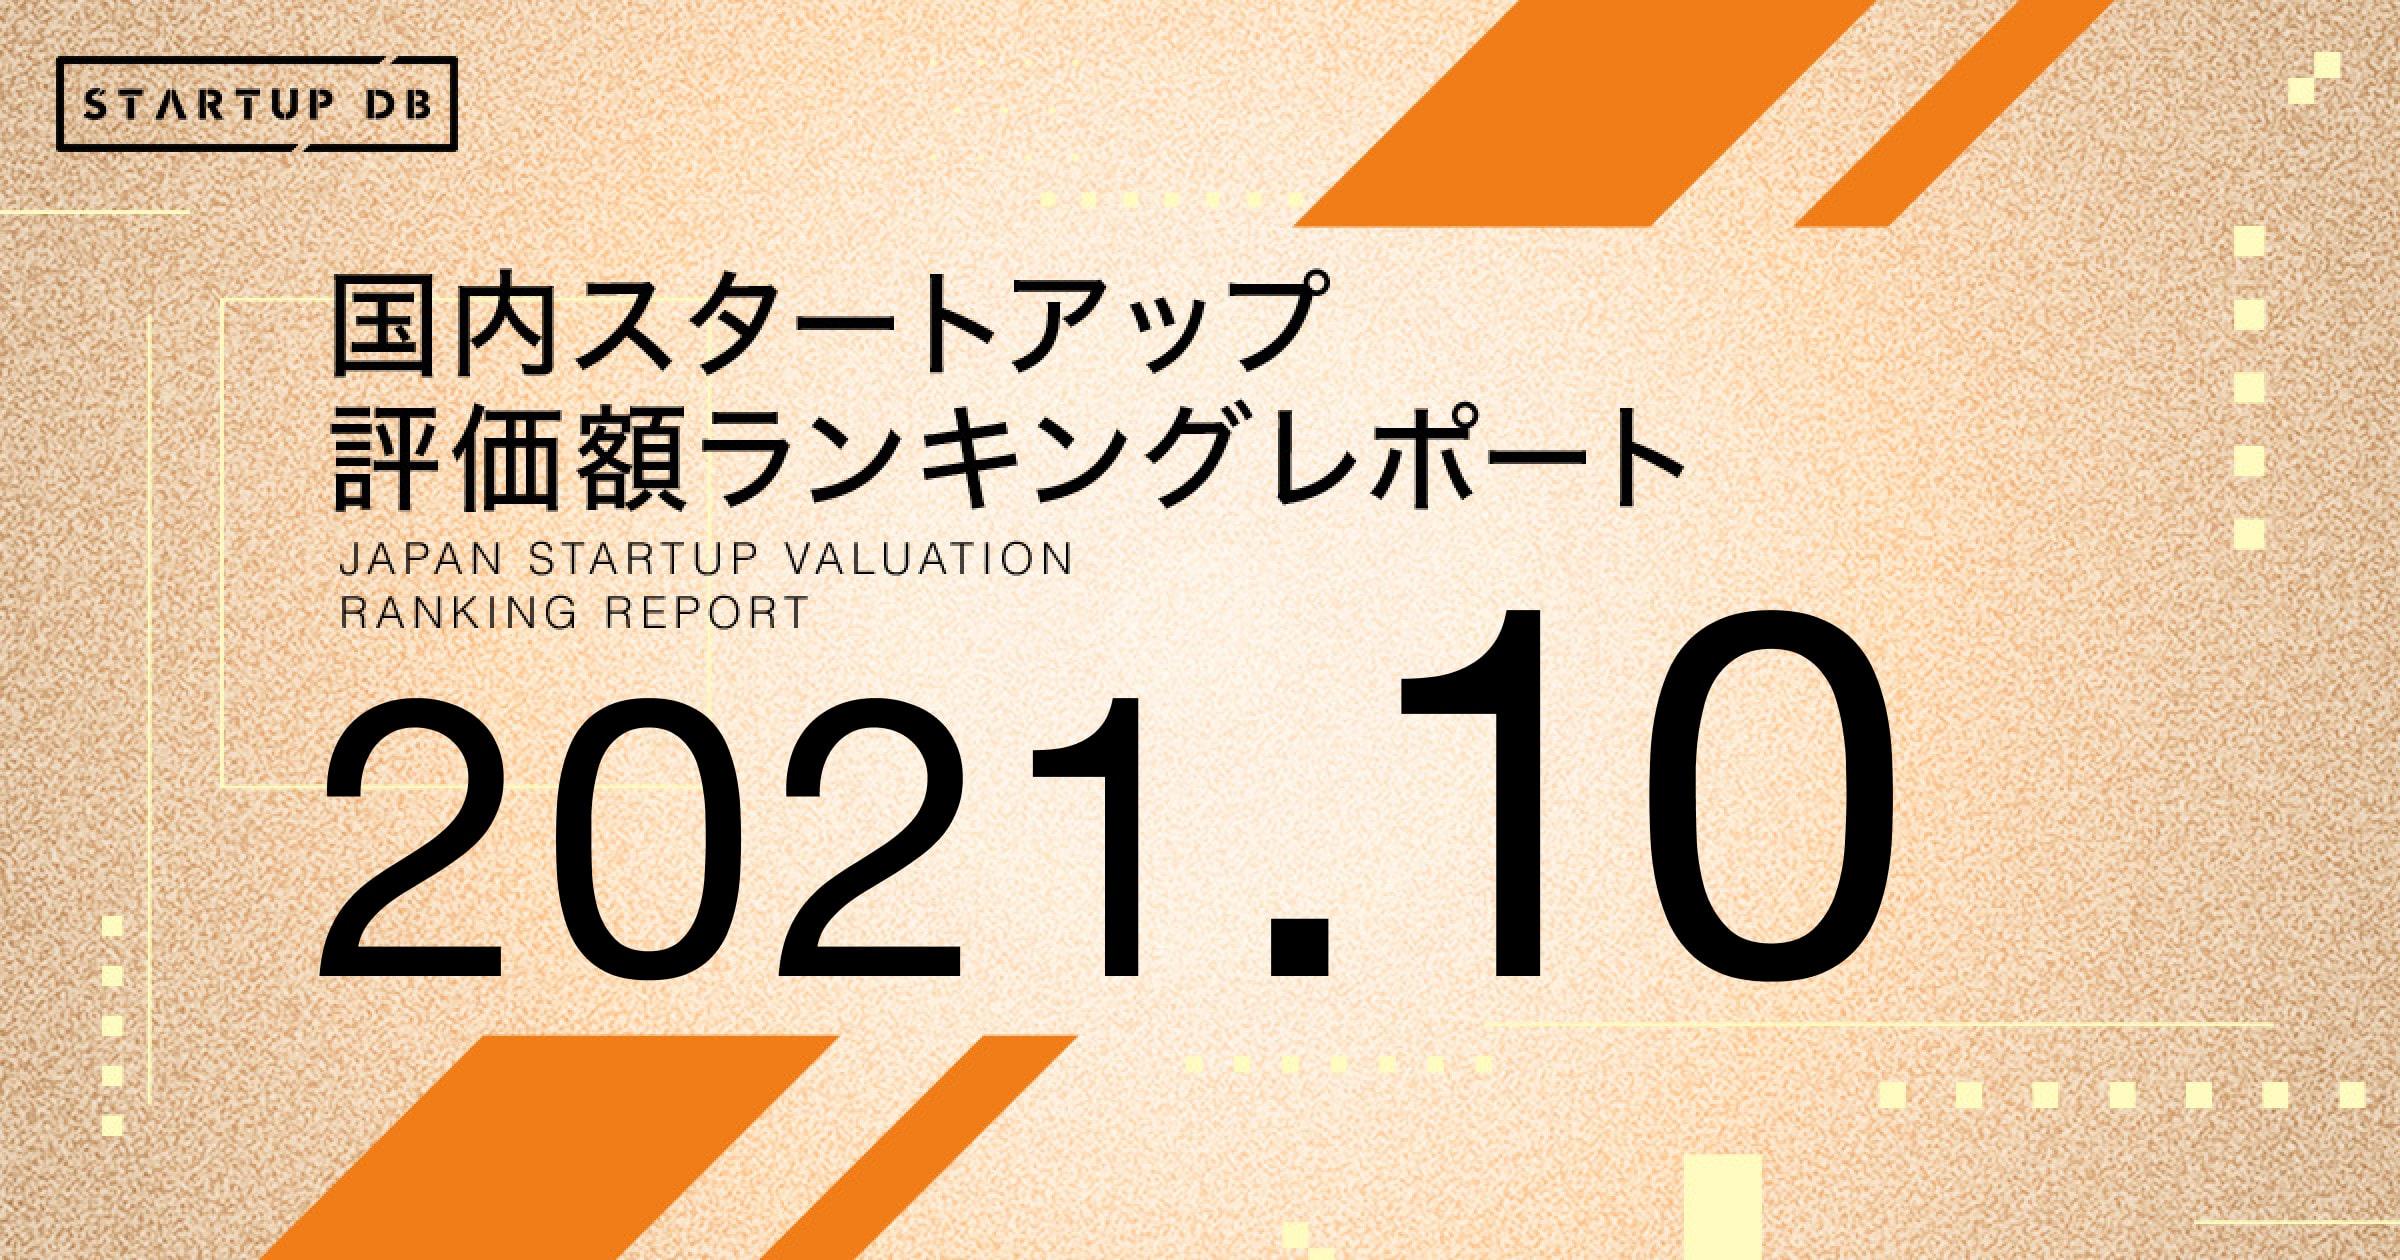 【STARTUP DB】調査結果 国内スタートアップ評価額ランキング(2021年10月)